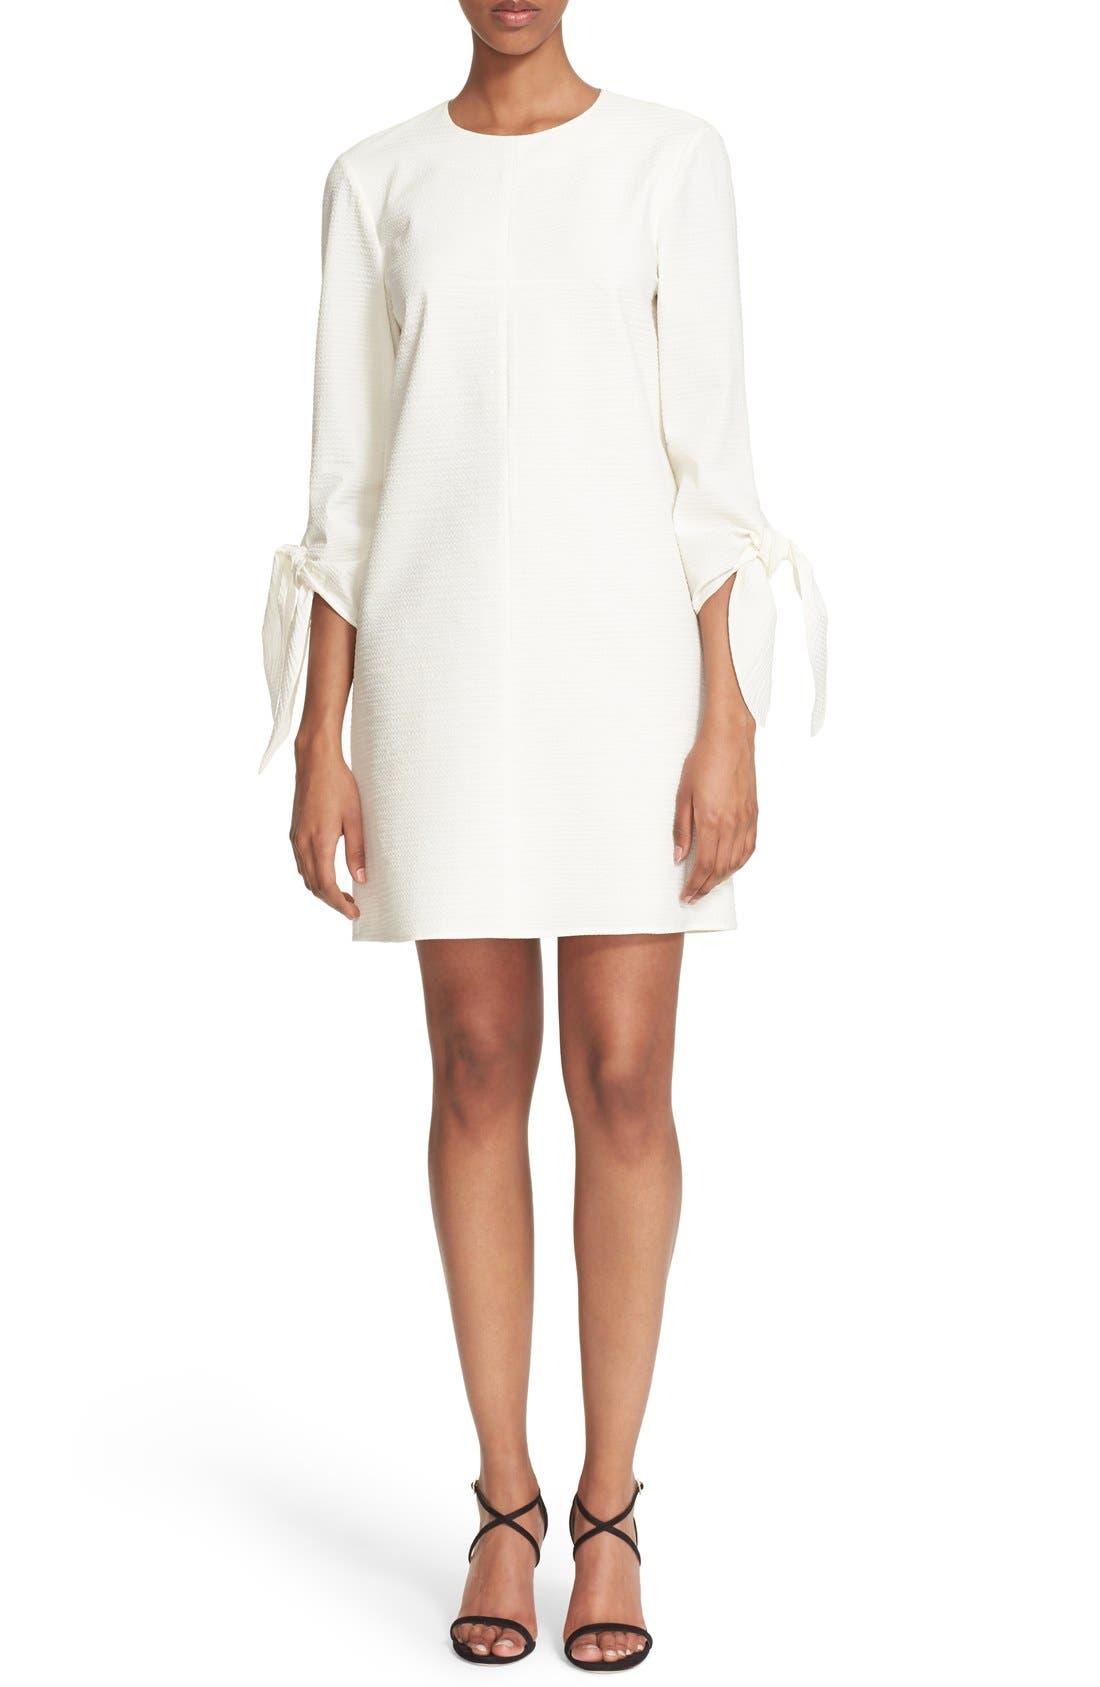 TIBI, Tie Sleeve Textured Cotton Blend Shift Dress, Main thumbnail 1, color, 100